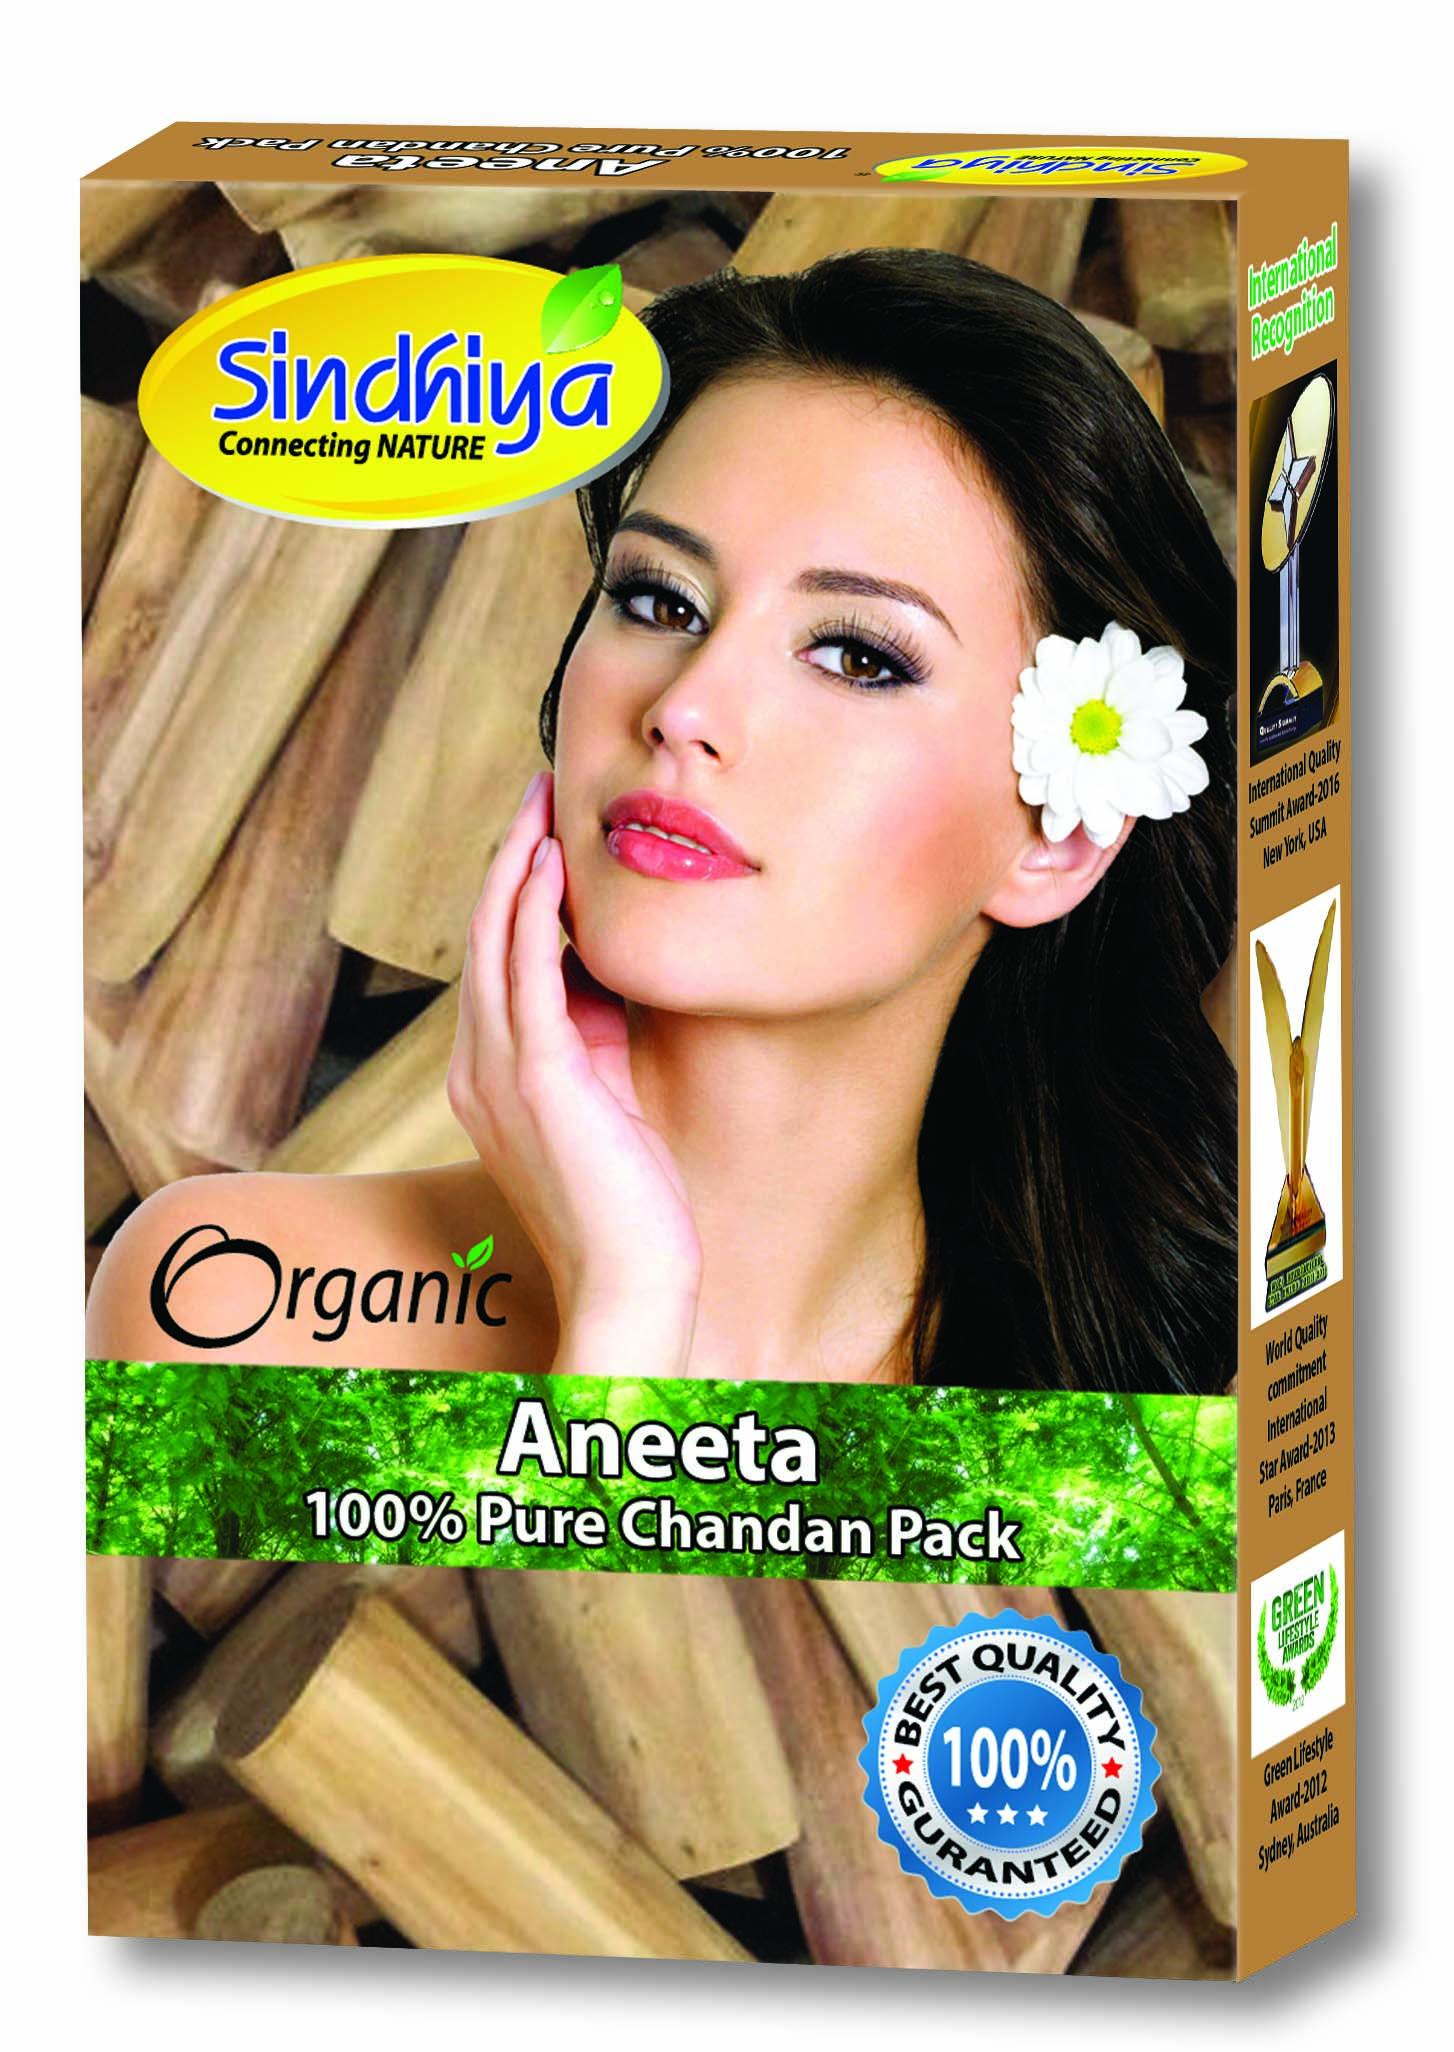 Aneeta - 100% Pure Chandan